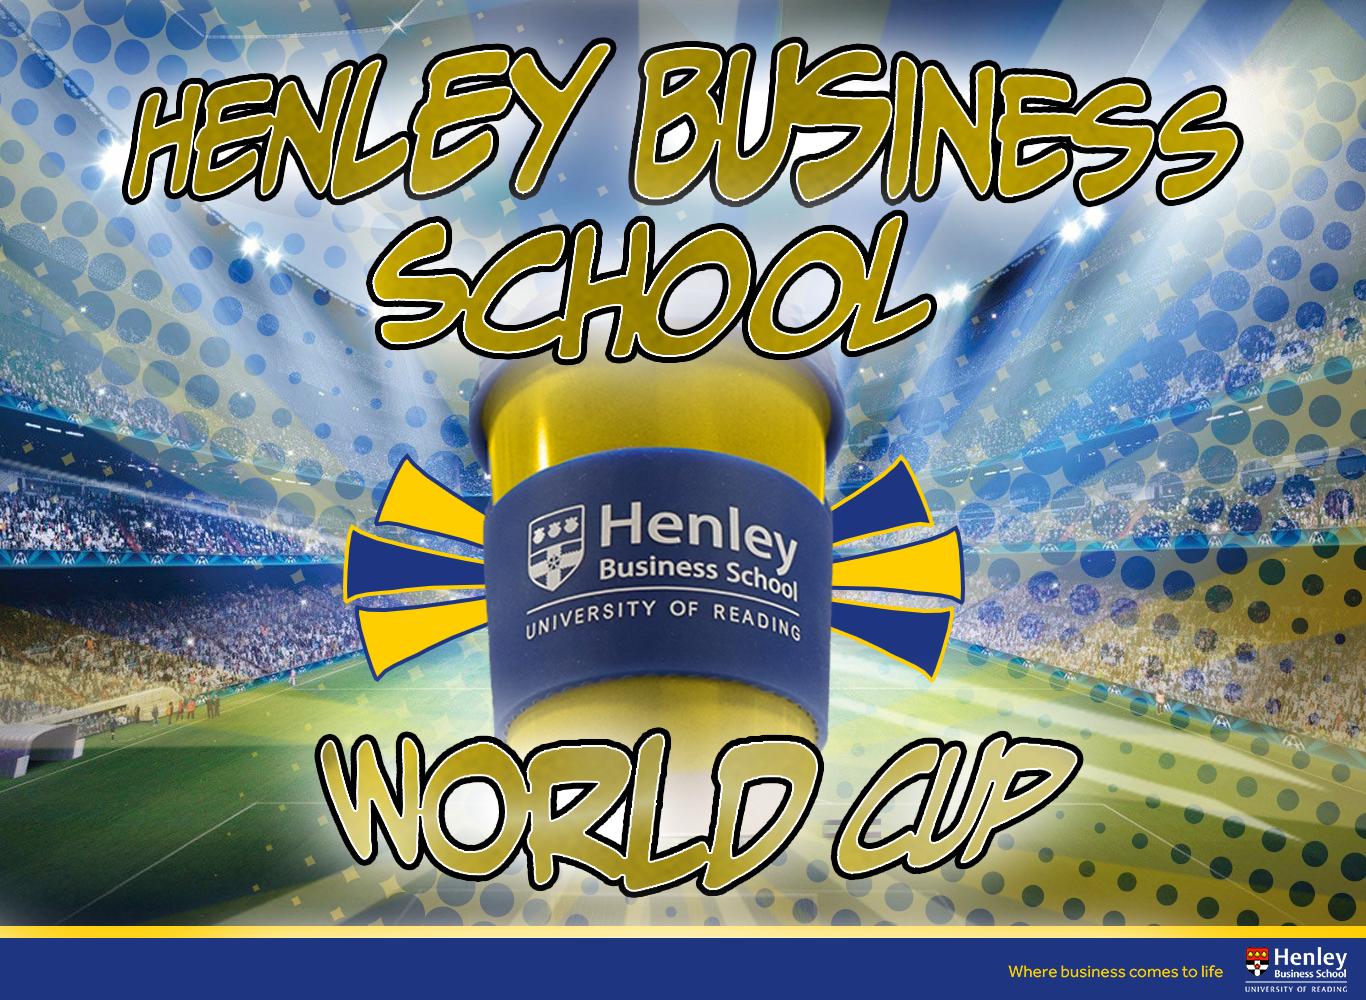 Henley World Cup 2018 | Henley Business School